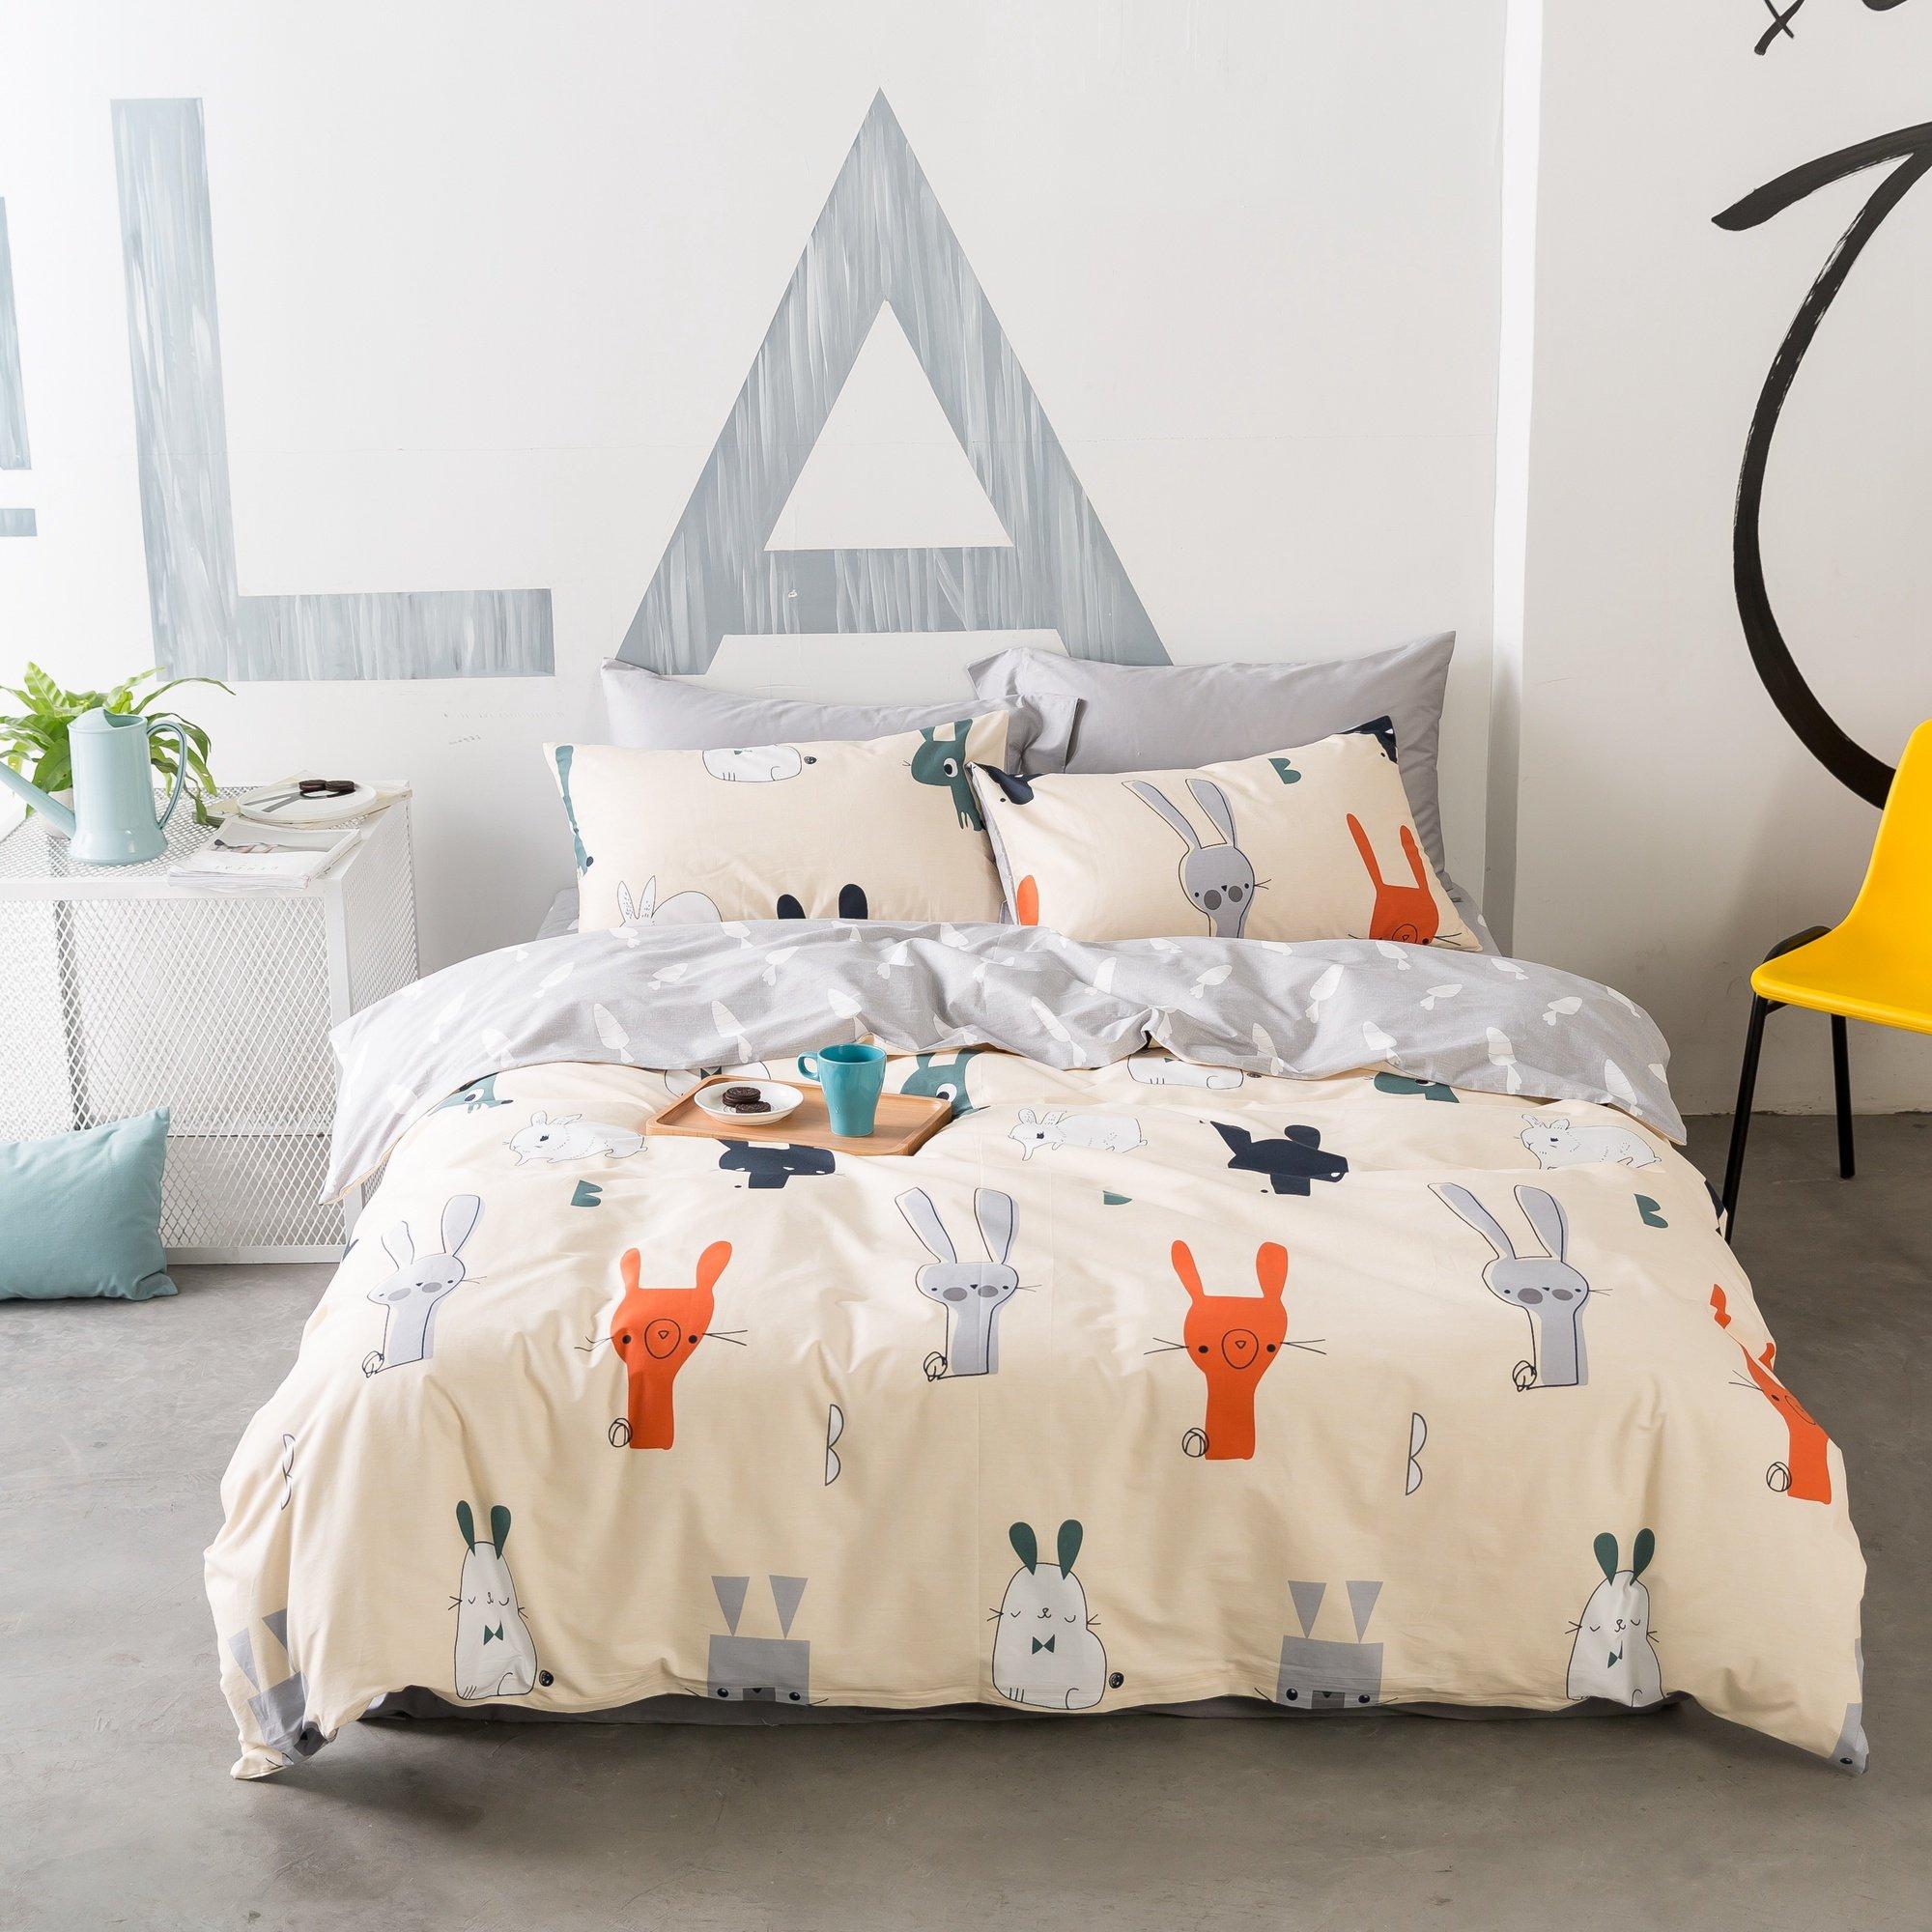 Beddinginn Cotton Bunny Bedding Set Cute Bed Cover Set for Girls Reversible 3pcs Bed Duvet Cover Set (Twin)